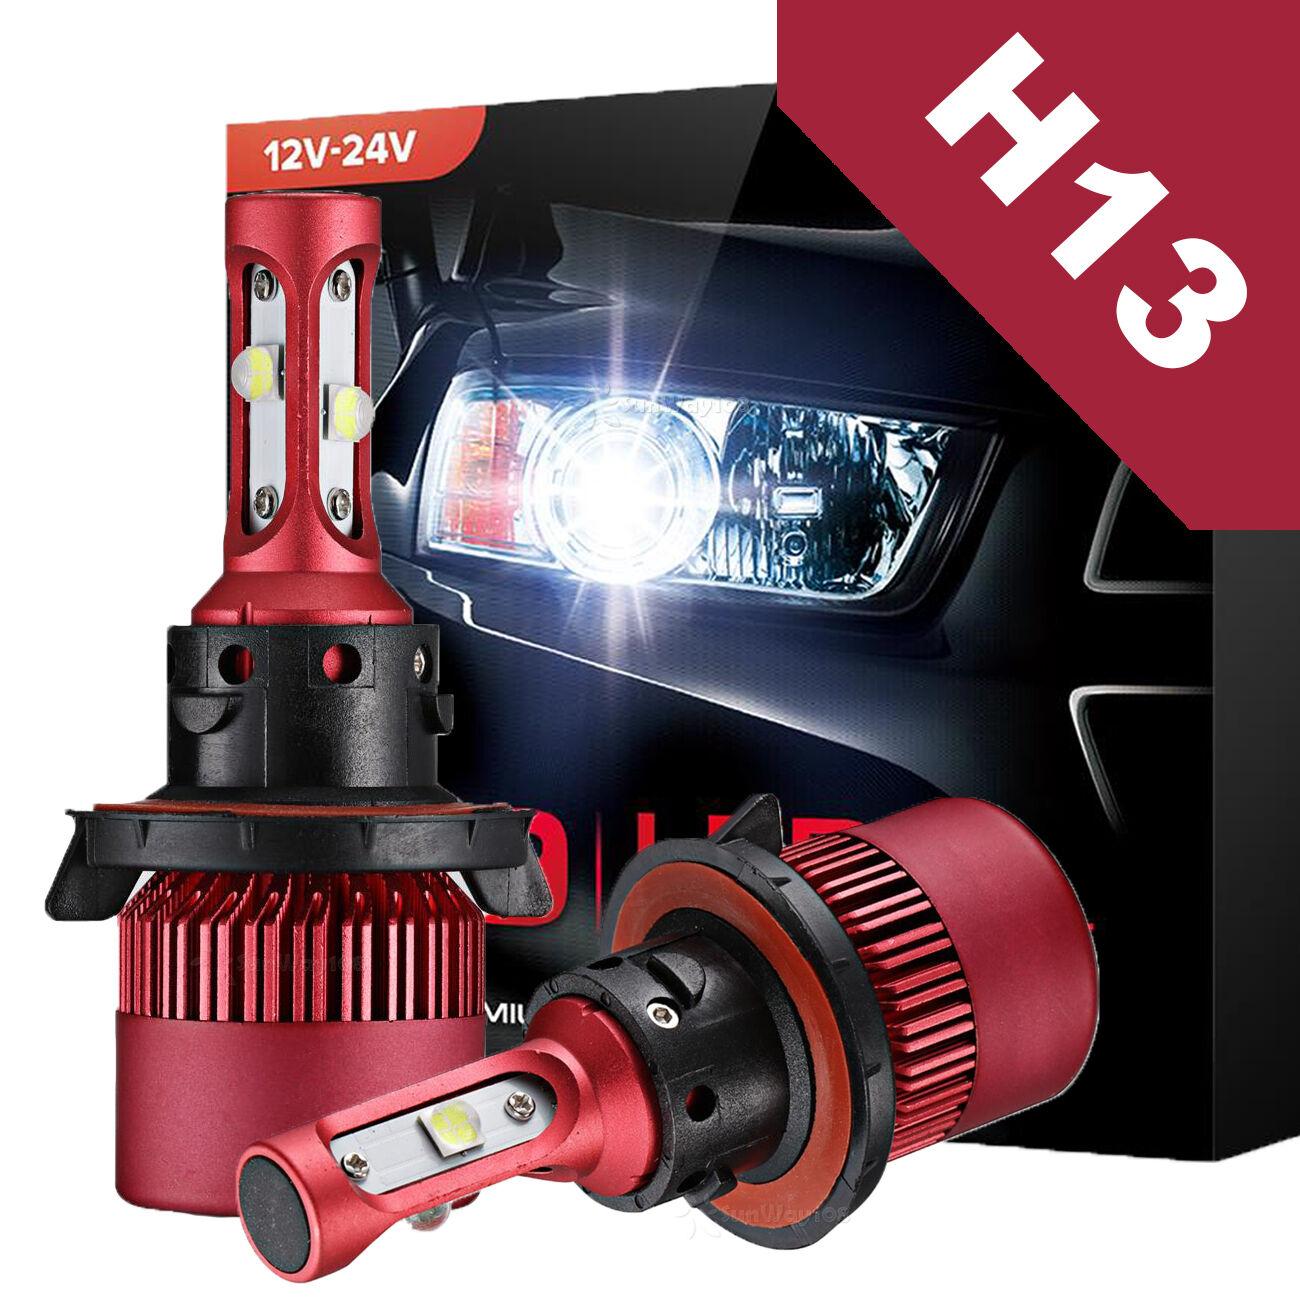 CREE H13 9008 Car LED Headlight Kit Light Hi/Lo Beam 6000K 1020W 153000LM Bulbs